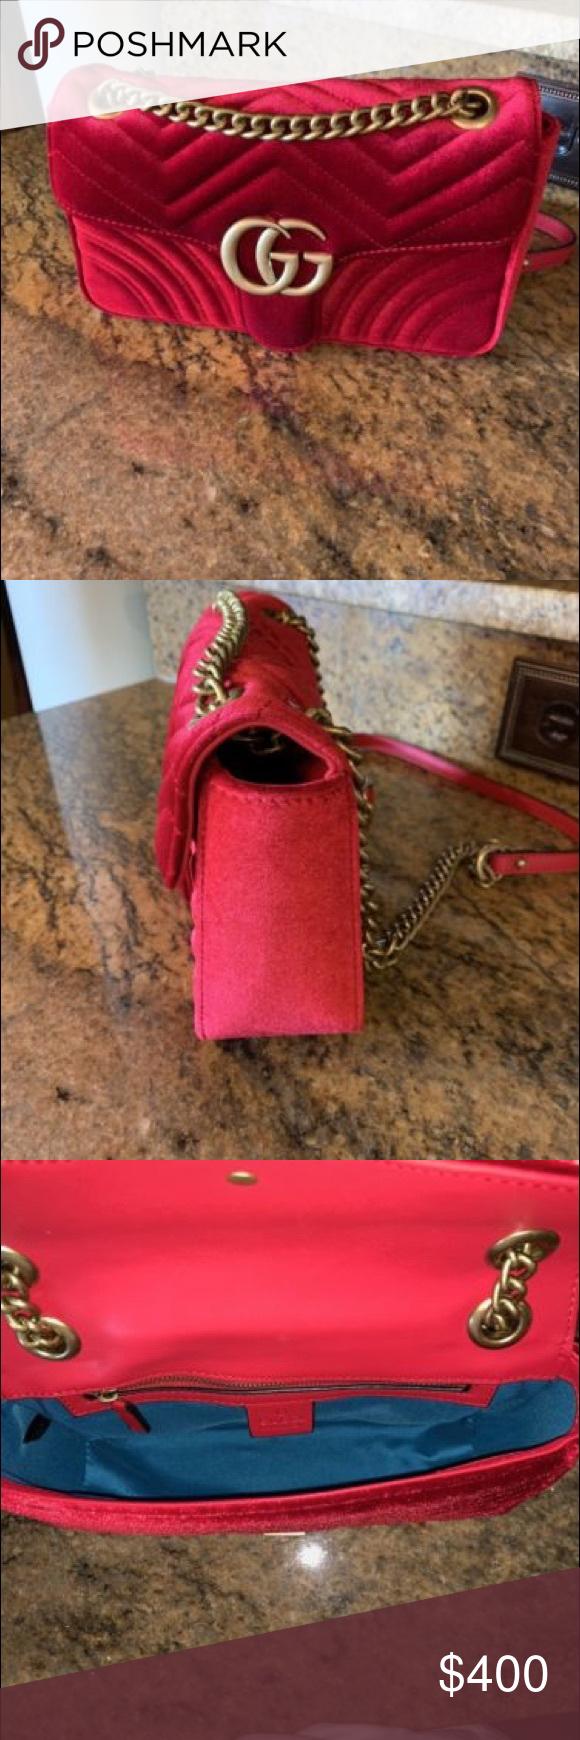 6c479b3a7489d0 Gucci Marmont Handbag Gucci GG Marmont red velvet small shoulder .